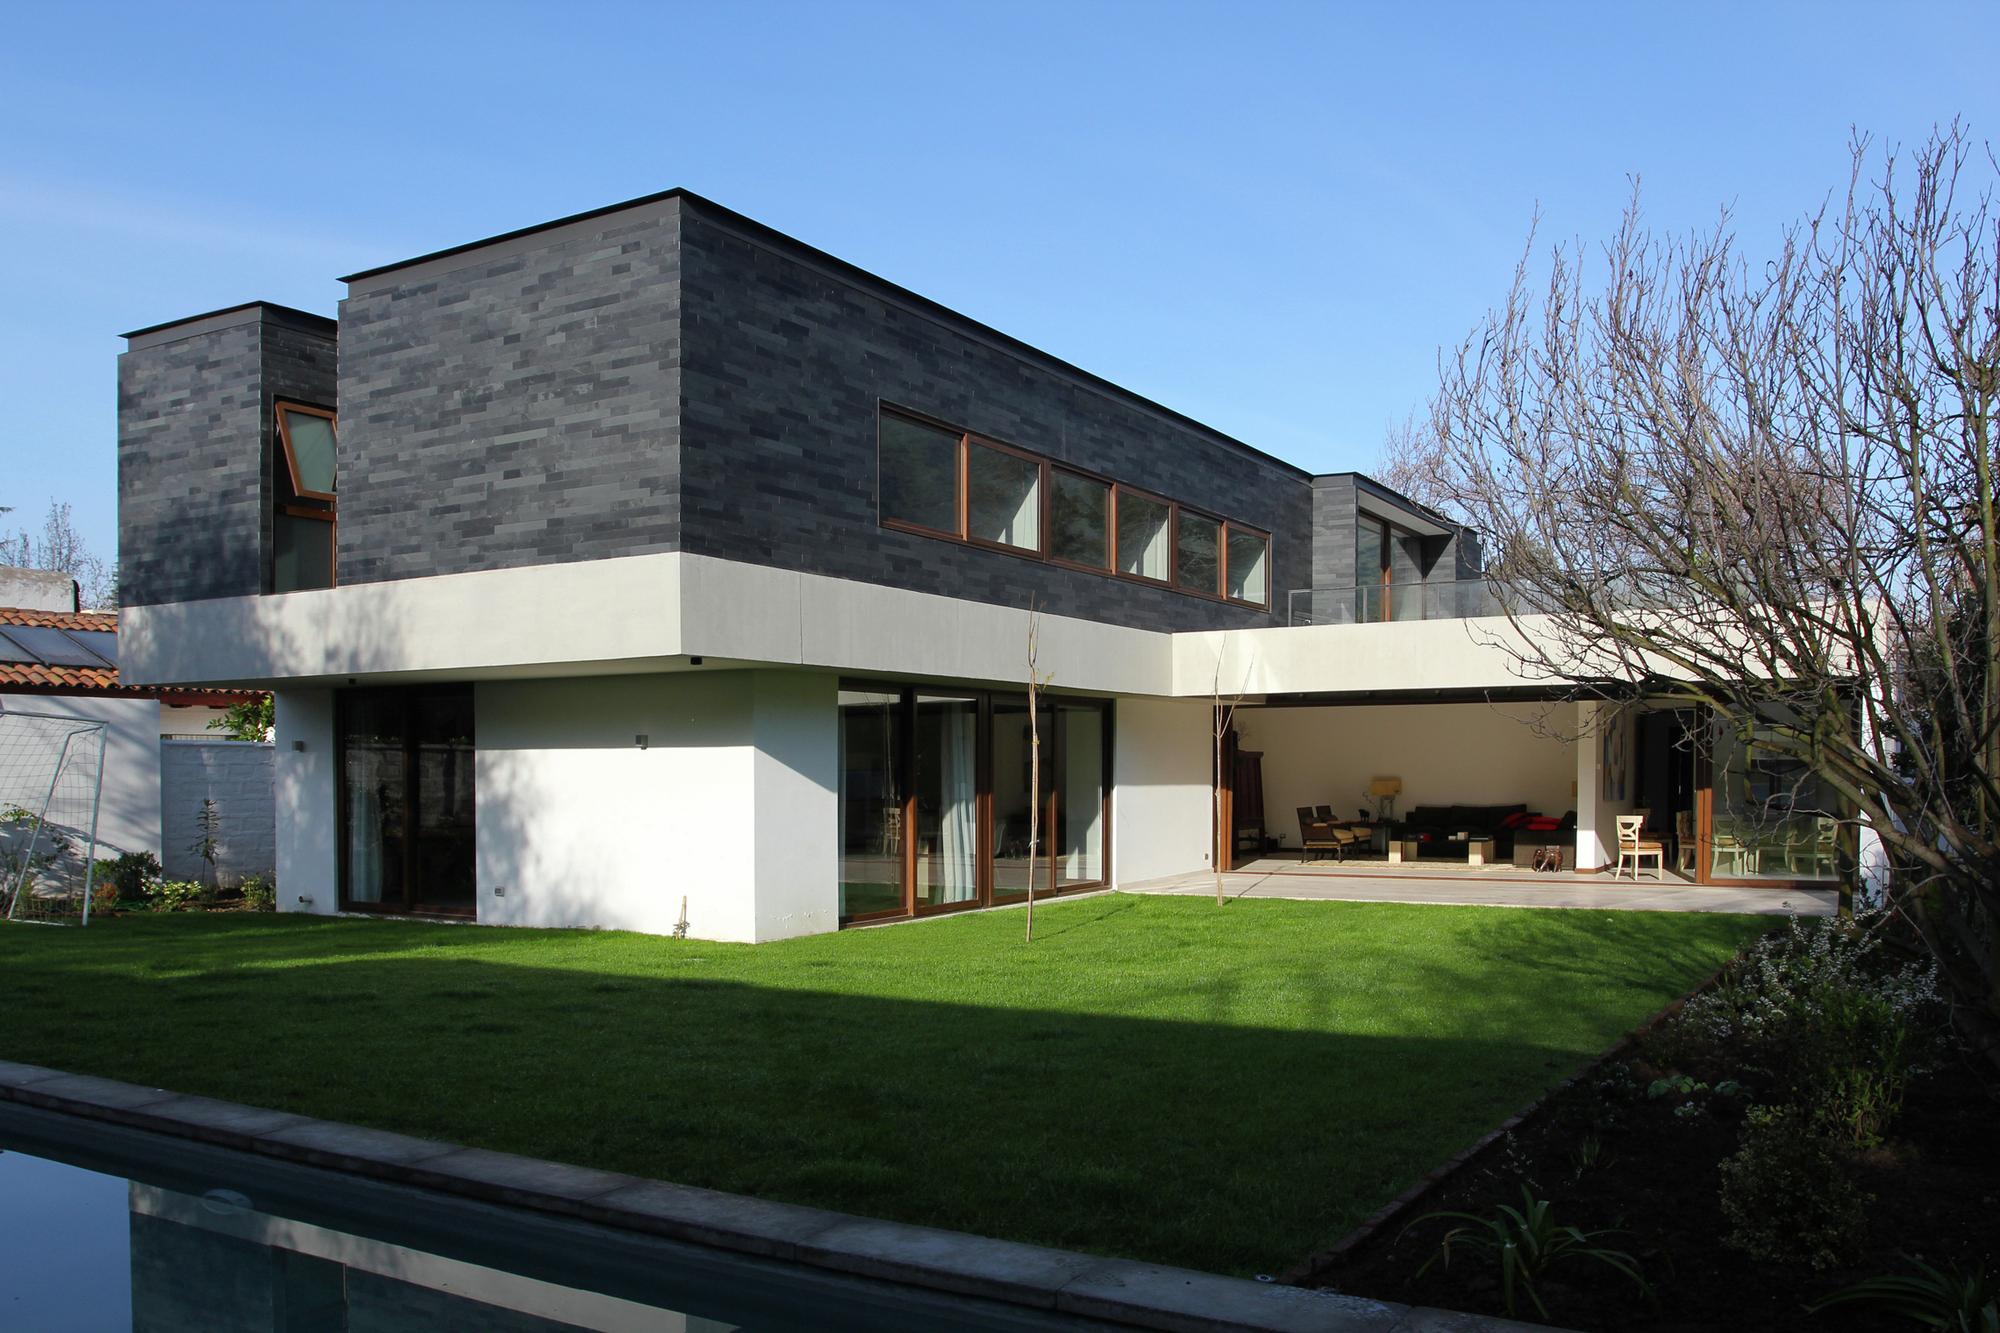 Cadaques House Remodeling Altamirano Armanet Arquitectos